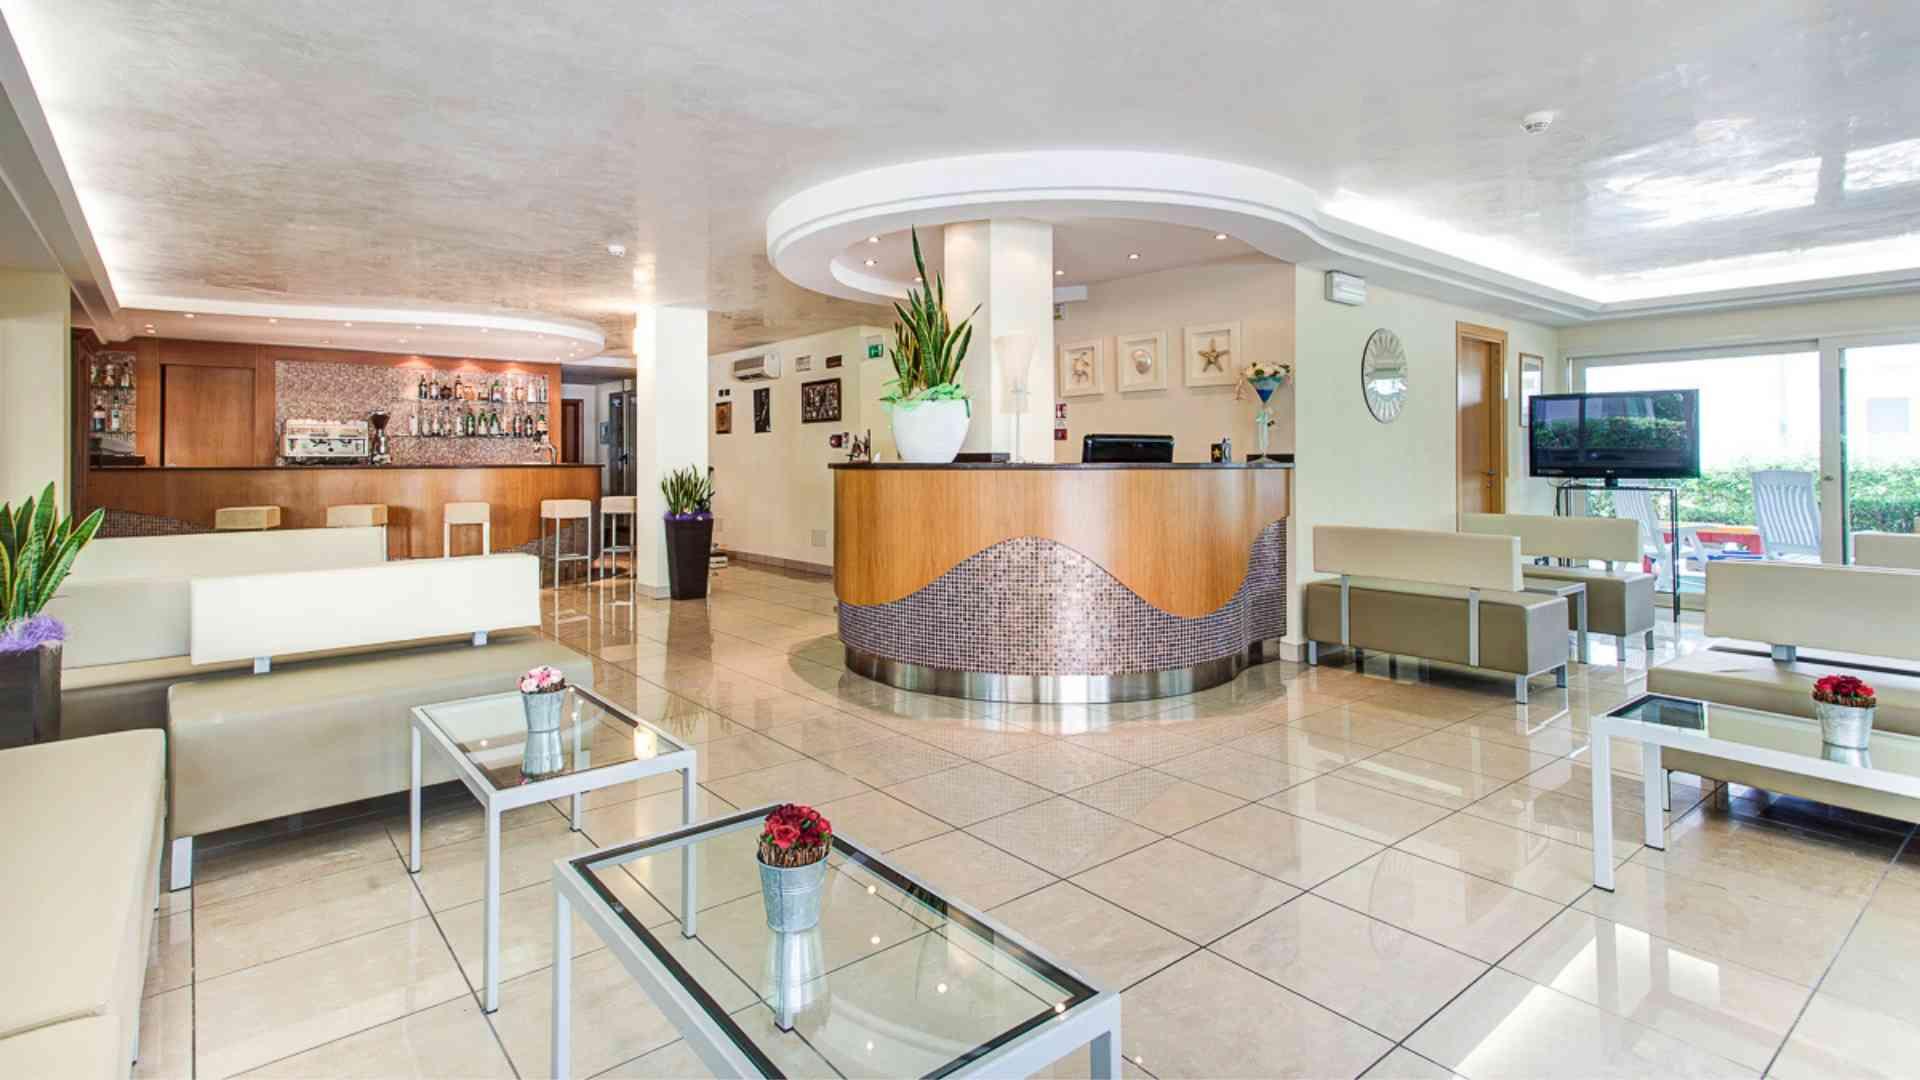 Interno_Hotel Dulac